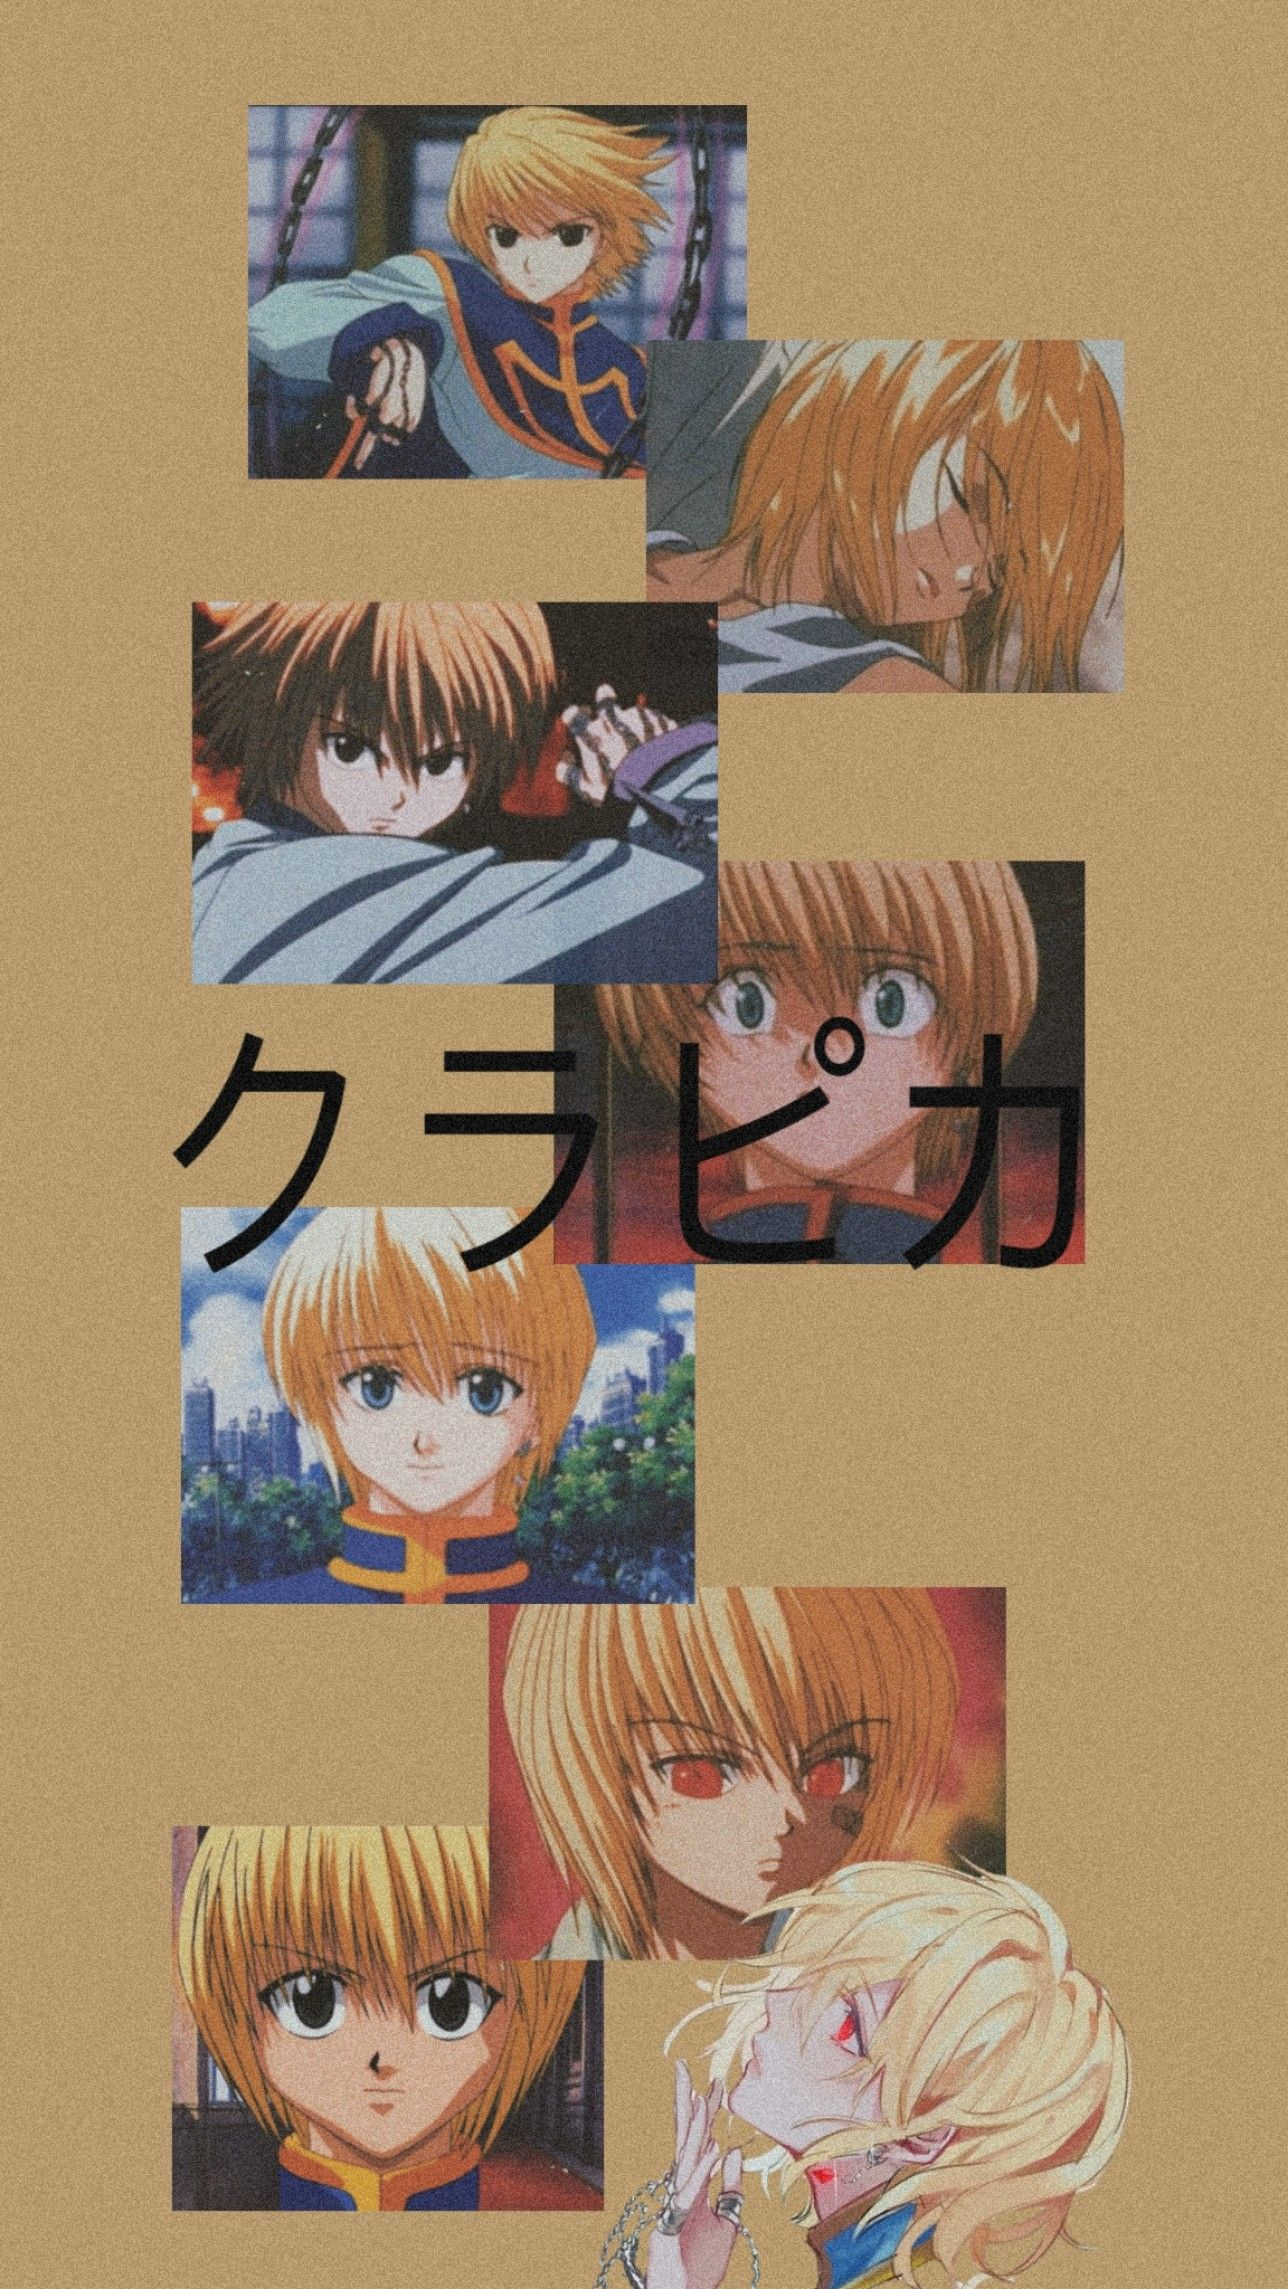 Kurapika Wallpaper Cute Anime Wallpaper Anime Wallpaper Cool Anime Wallpapers